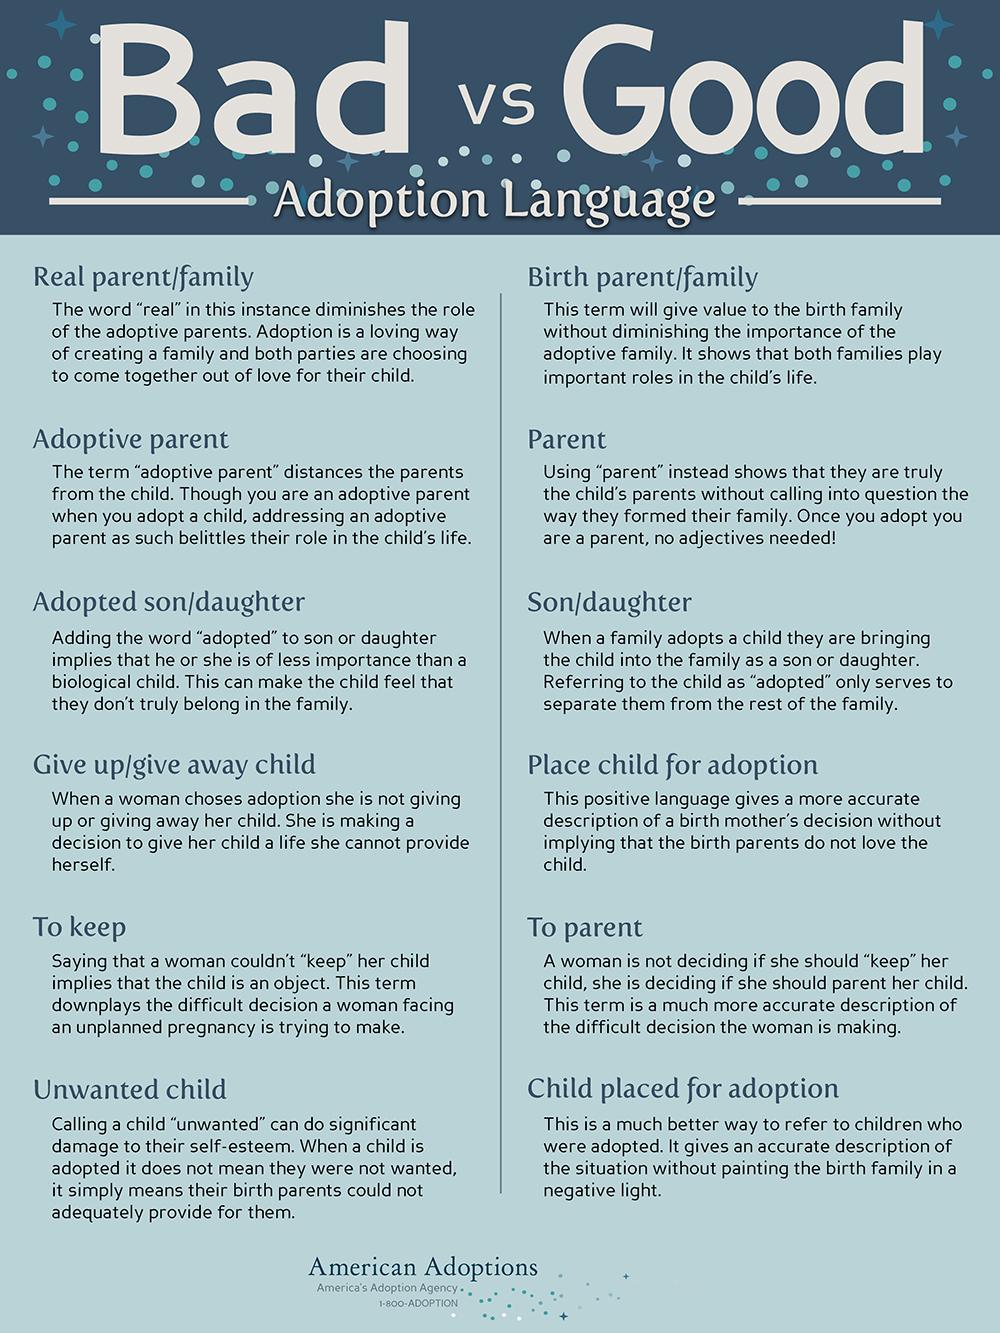 Adoption Language Infographic American Adoptions Blog